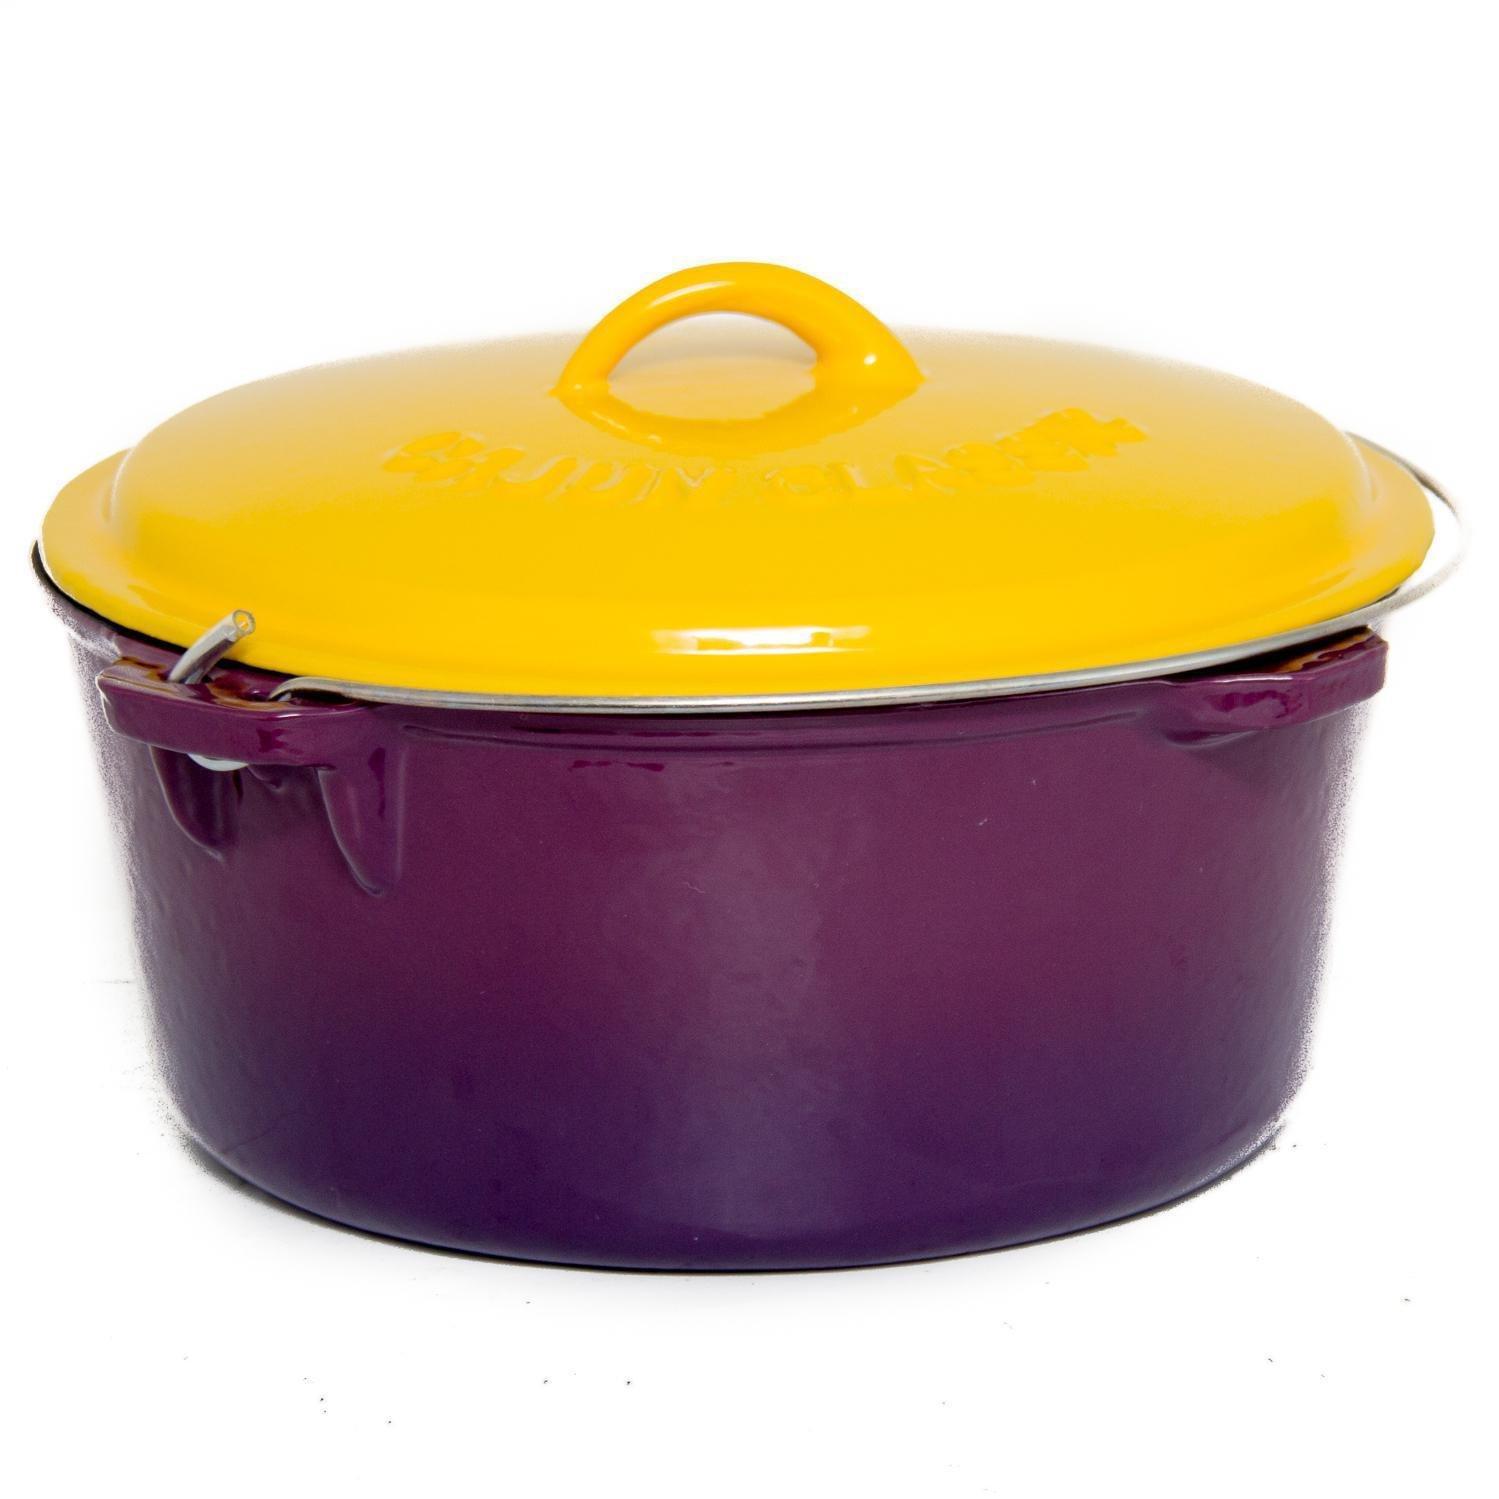 Cajun Classic 16-quart Enamel Cast Iron Dutch Oven - Purple & Gold - Gl10490pg